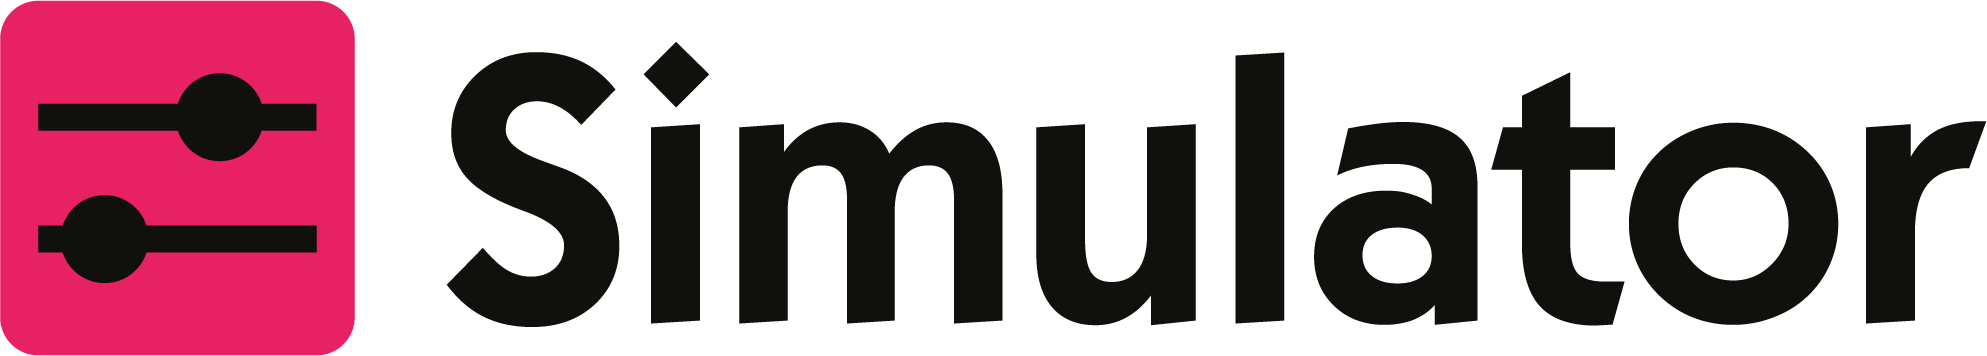 Simulator logo